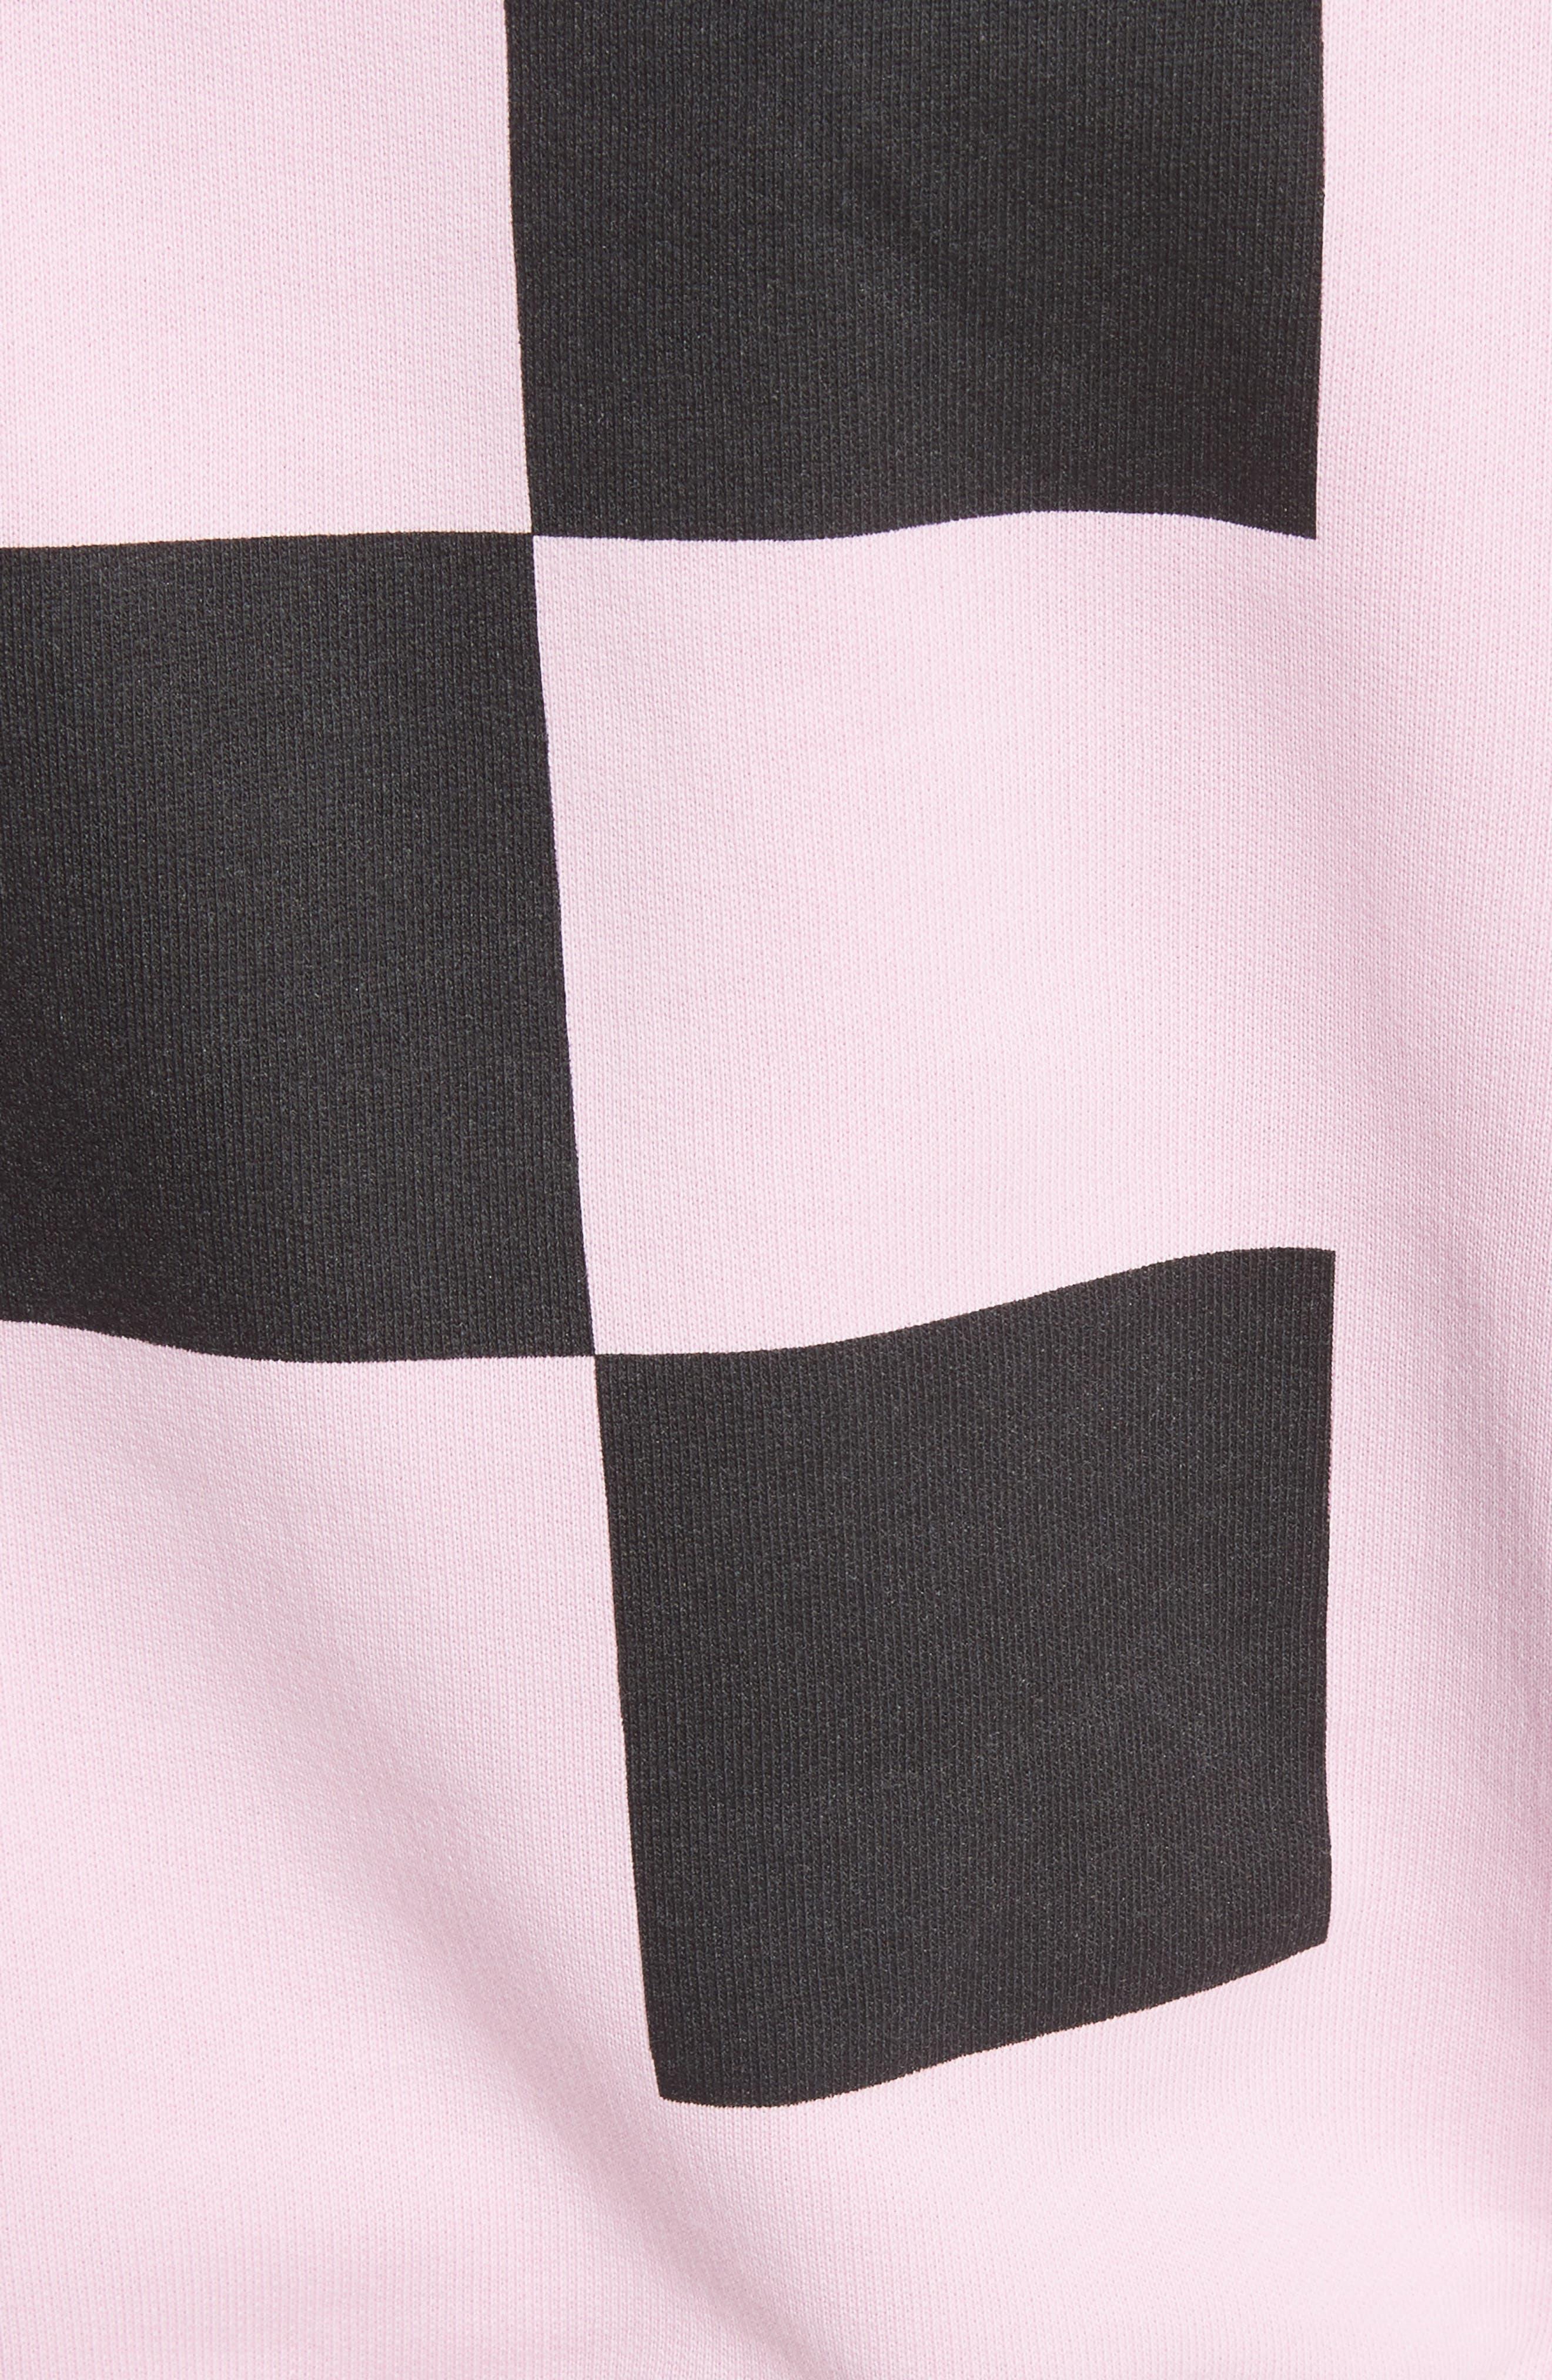 Taxi Crop Hoodie,                             Alternate thumbnail 7, color,                             Pink Black